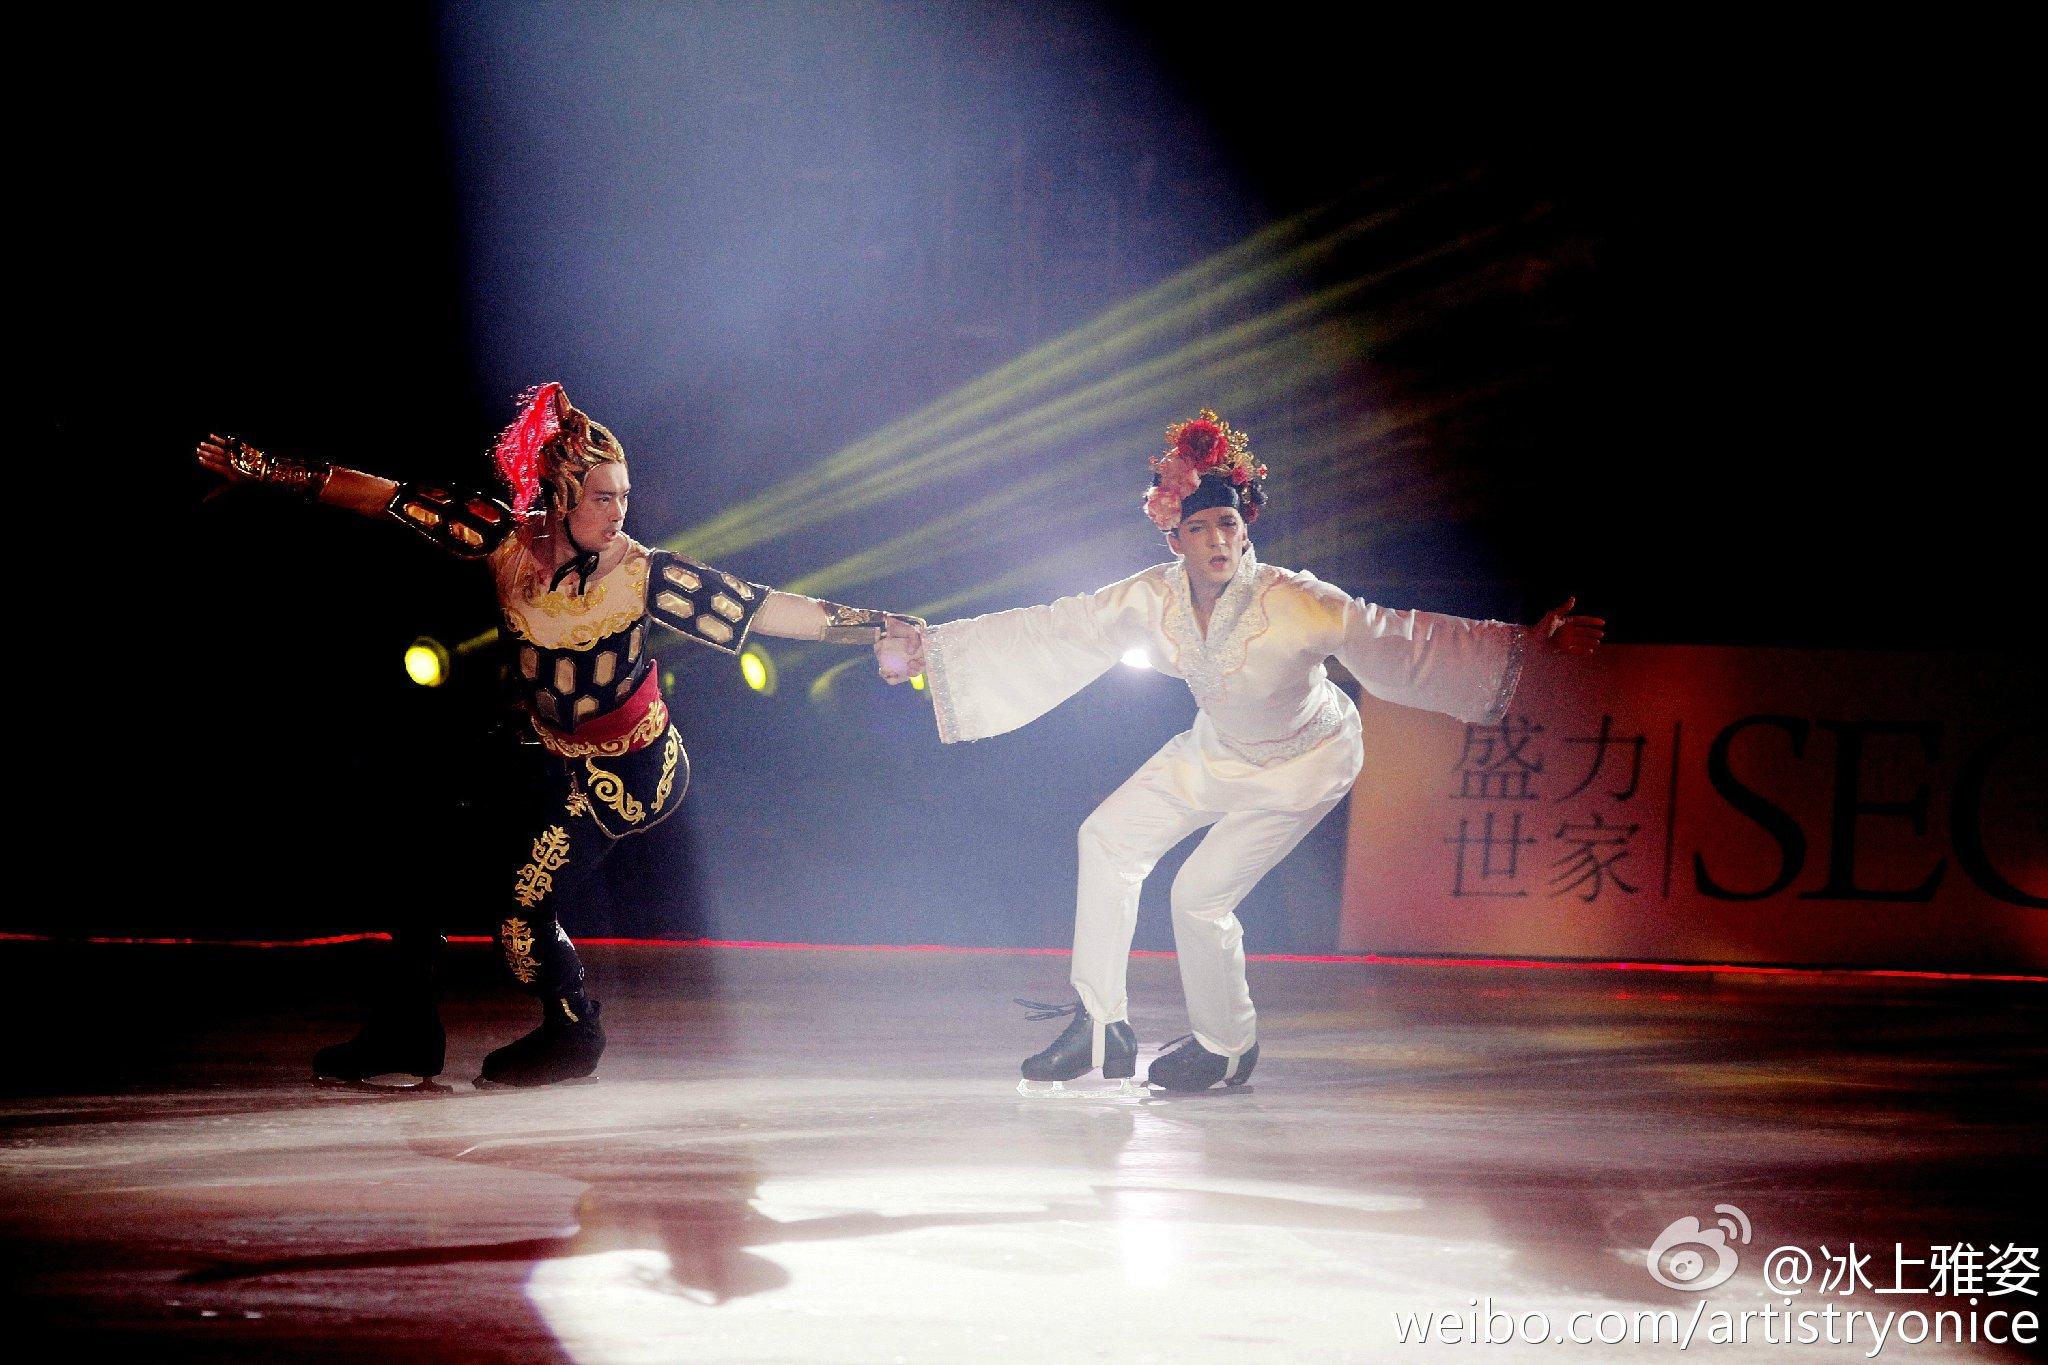 Ледовые шоу - 3  - Страница 2 7da576f2gw1etz5l5l6eyj21kw11xwpg